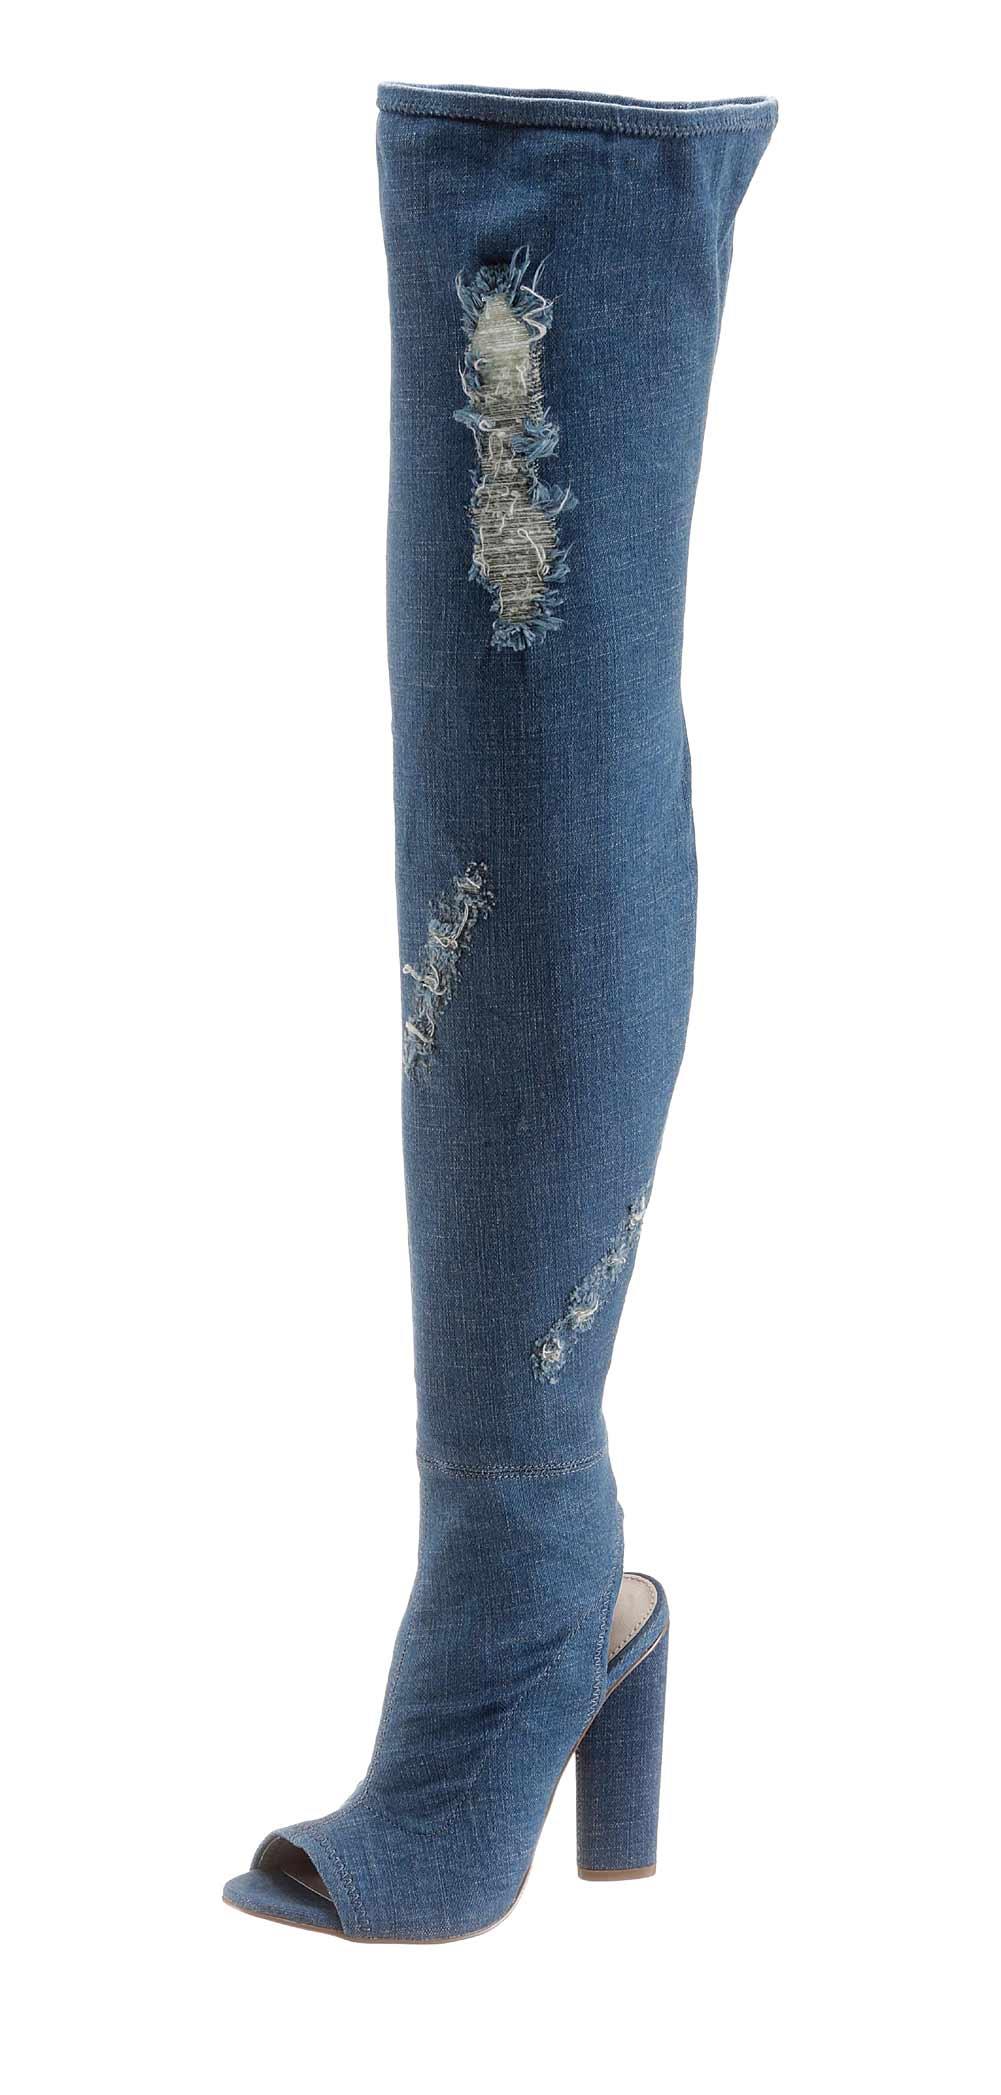 STEVE MADDEN Overknee-Stiefel jeansblau 658.734 Missforty